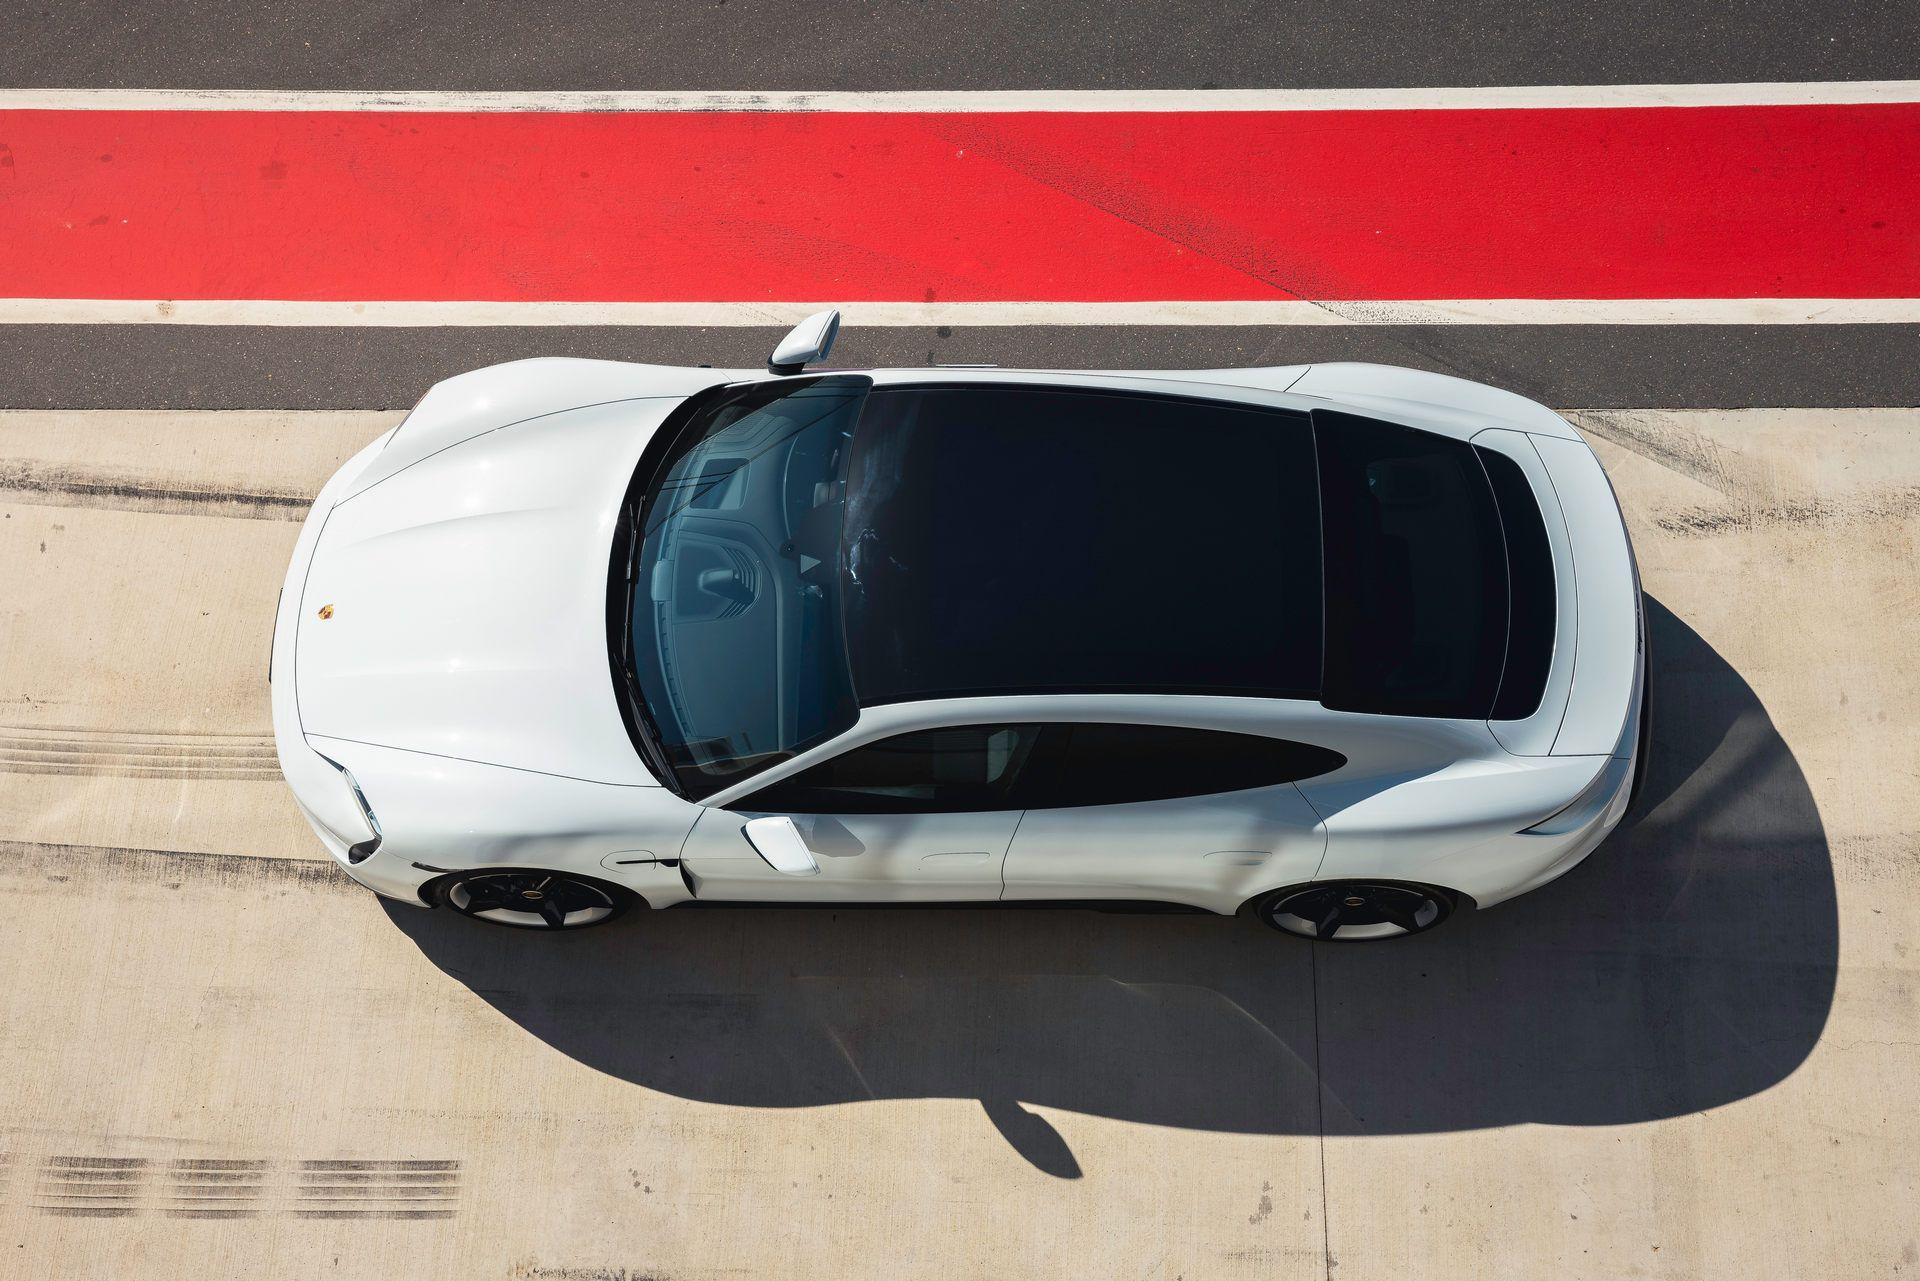 Porsche-Taycan-Turbo-S-The-Bend-Motorsport-Park-38